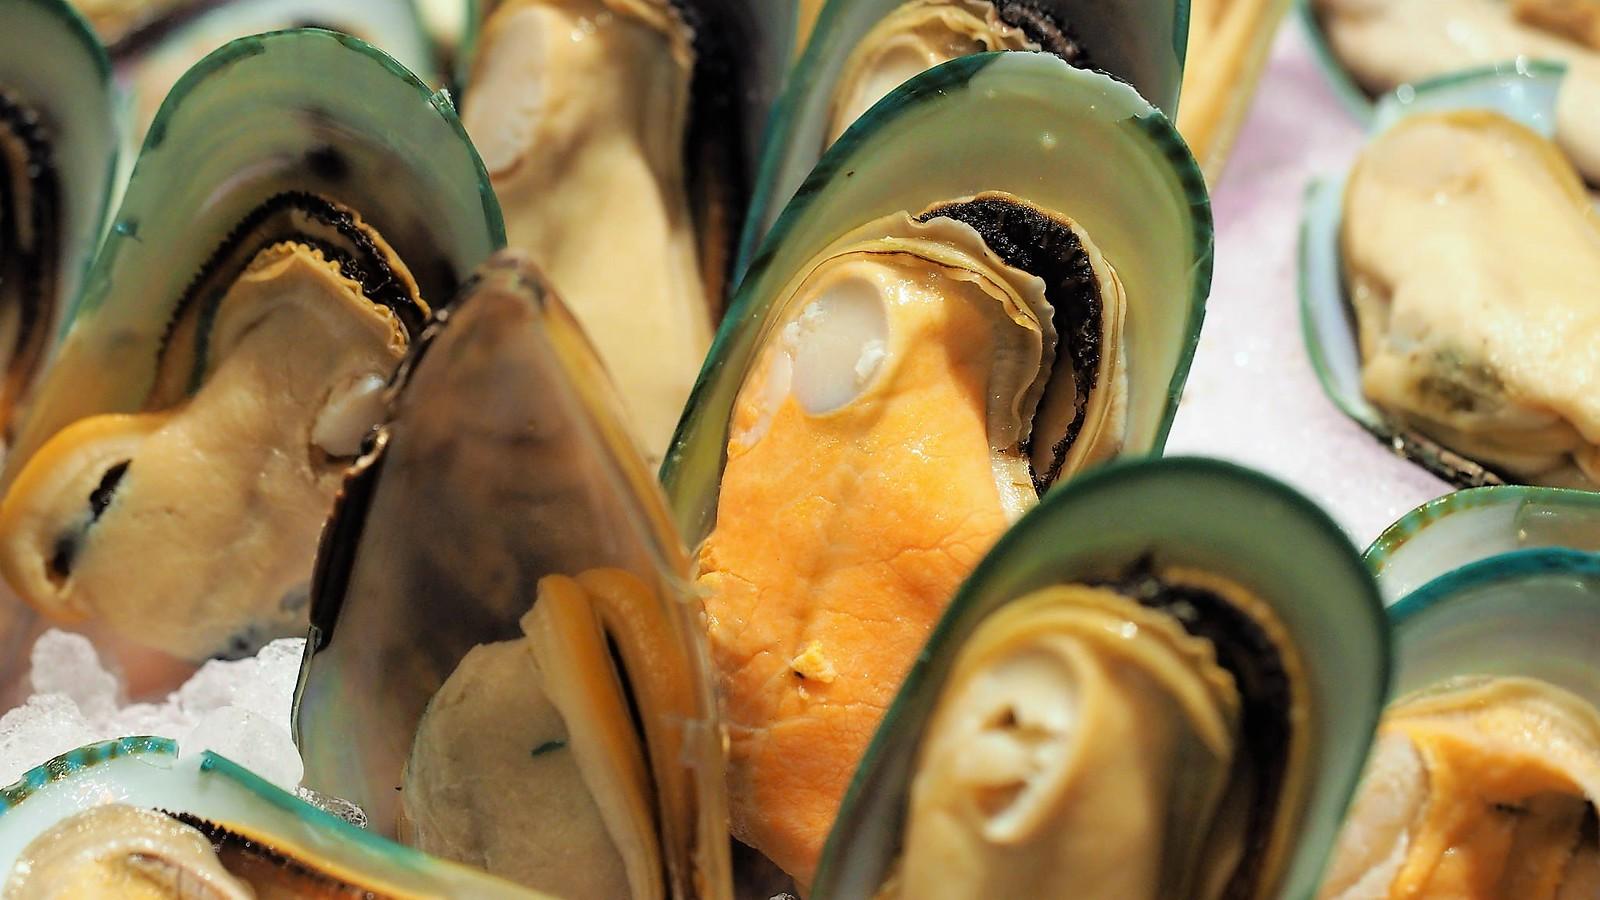 Mussels on ice at Feast @ Sheraton Petaling Jaya